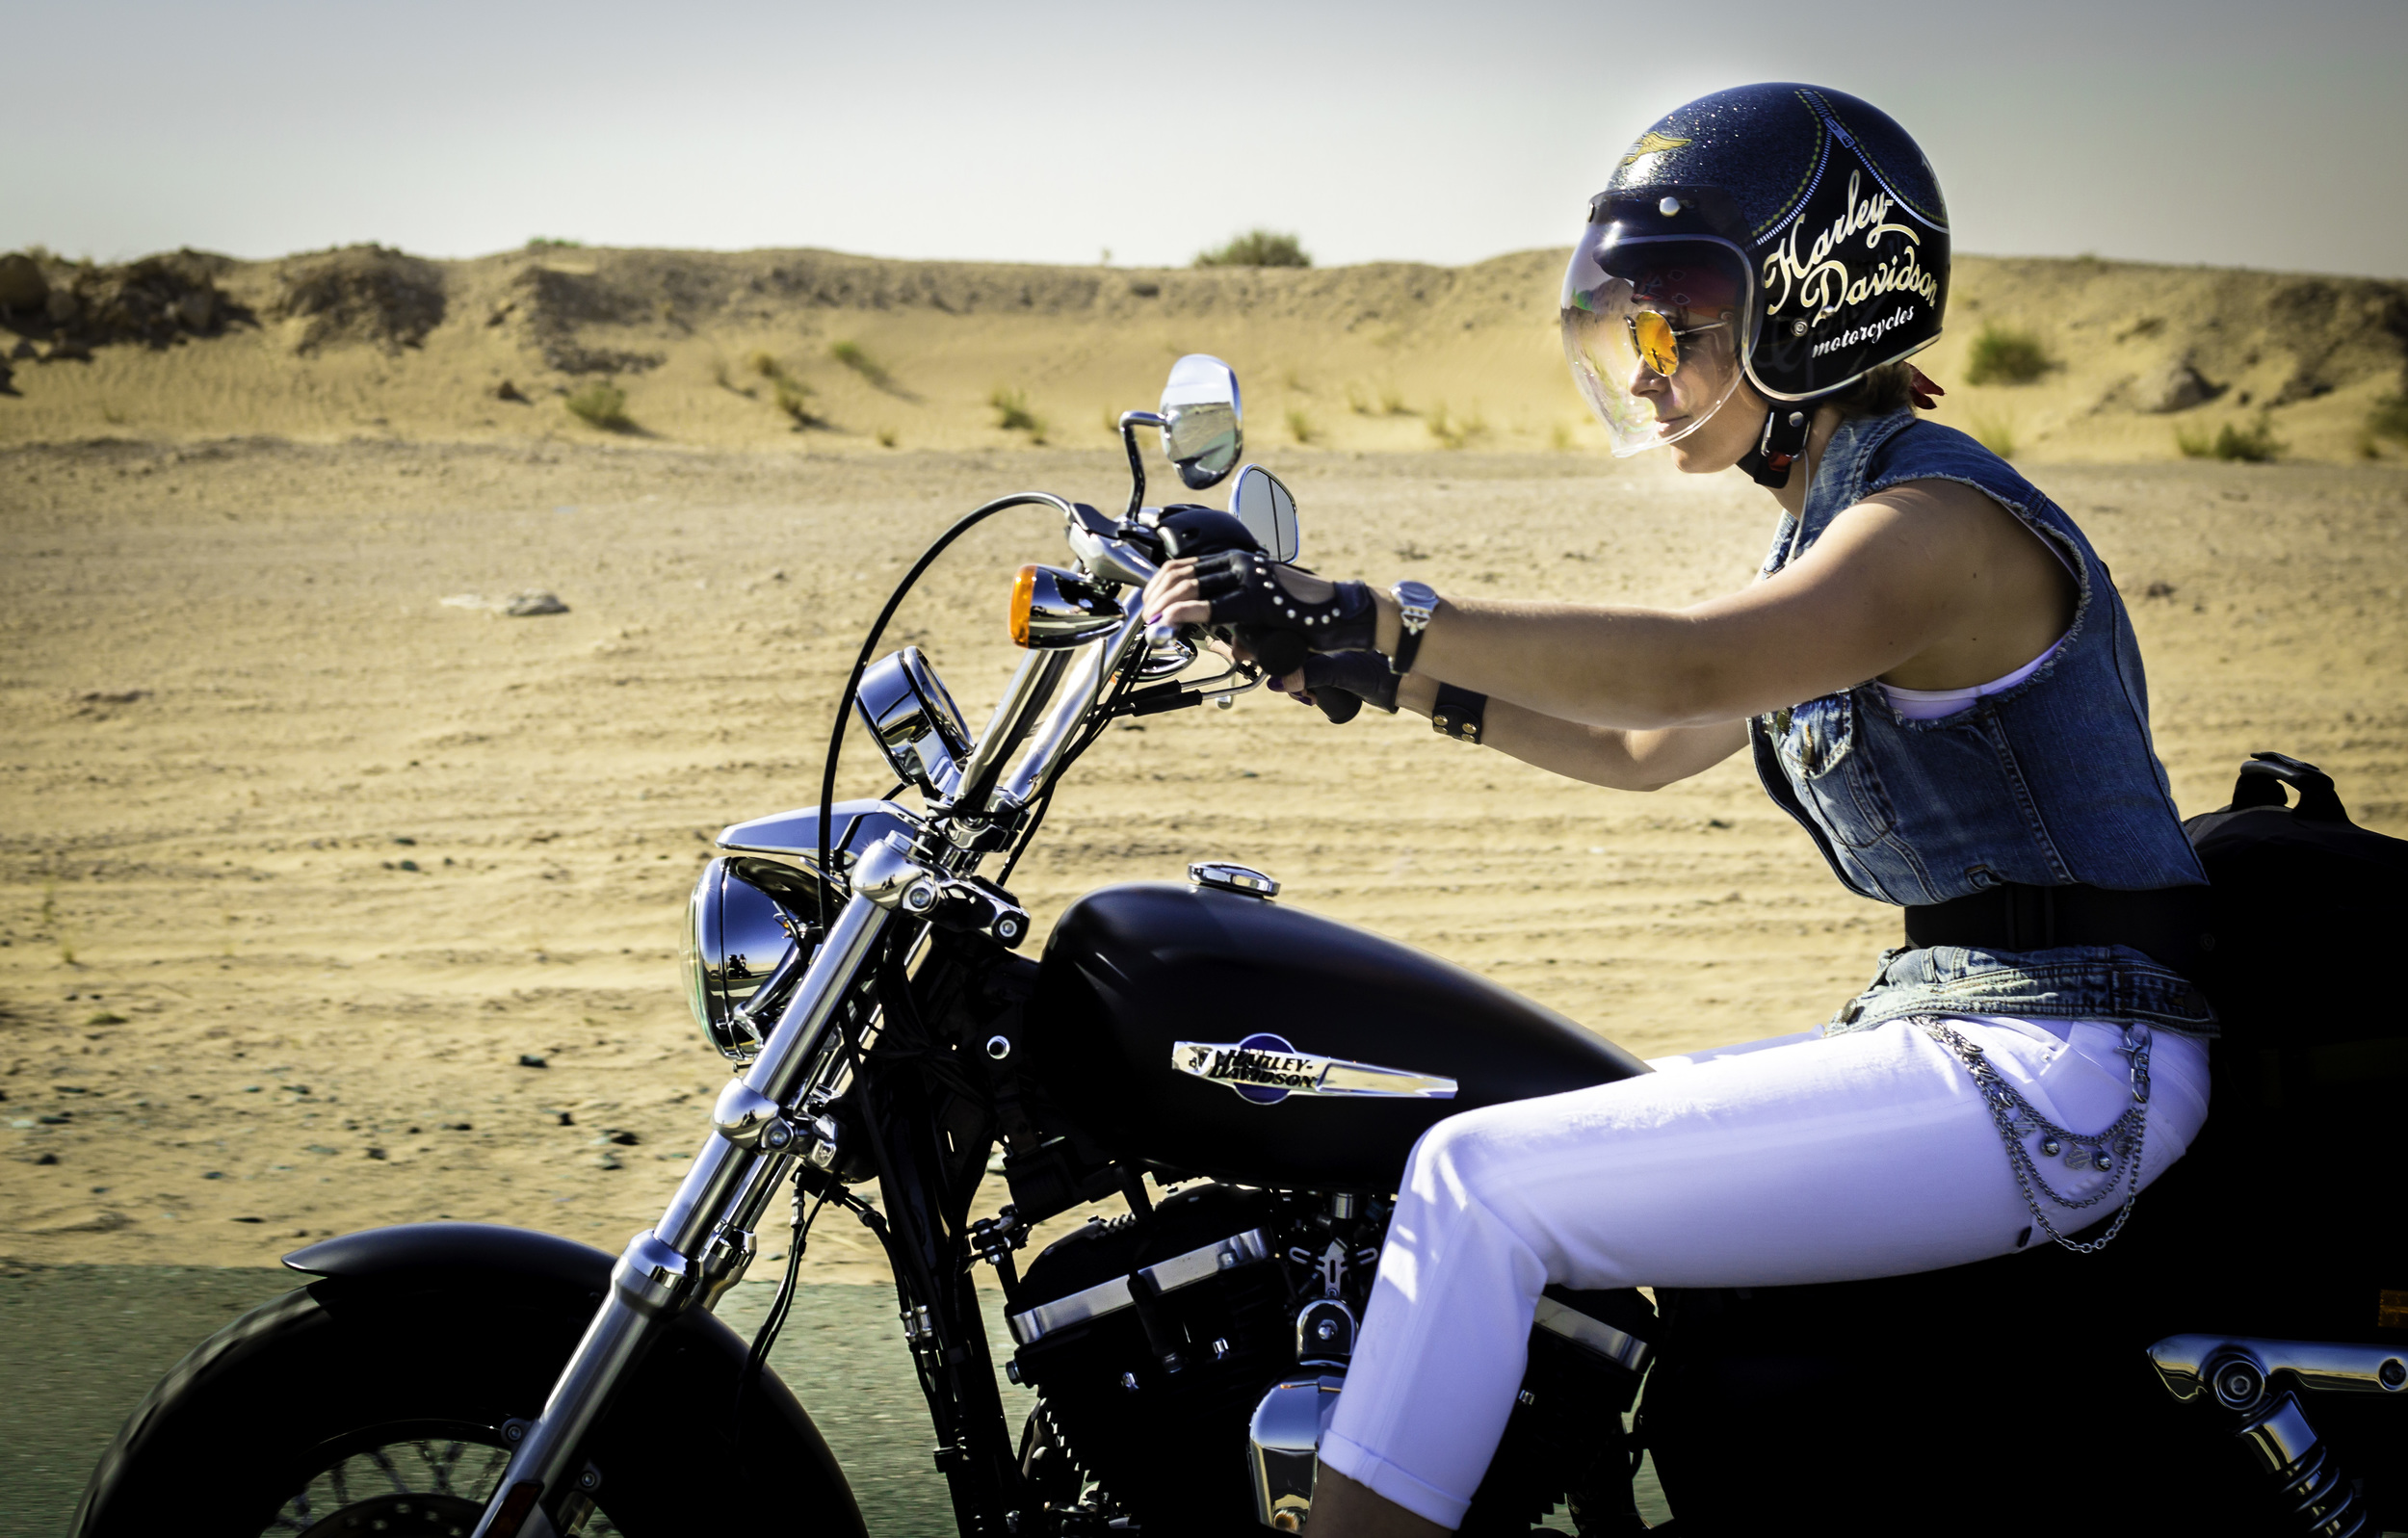 Taking back the reins: Dubai's female bikers in control -